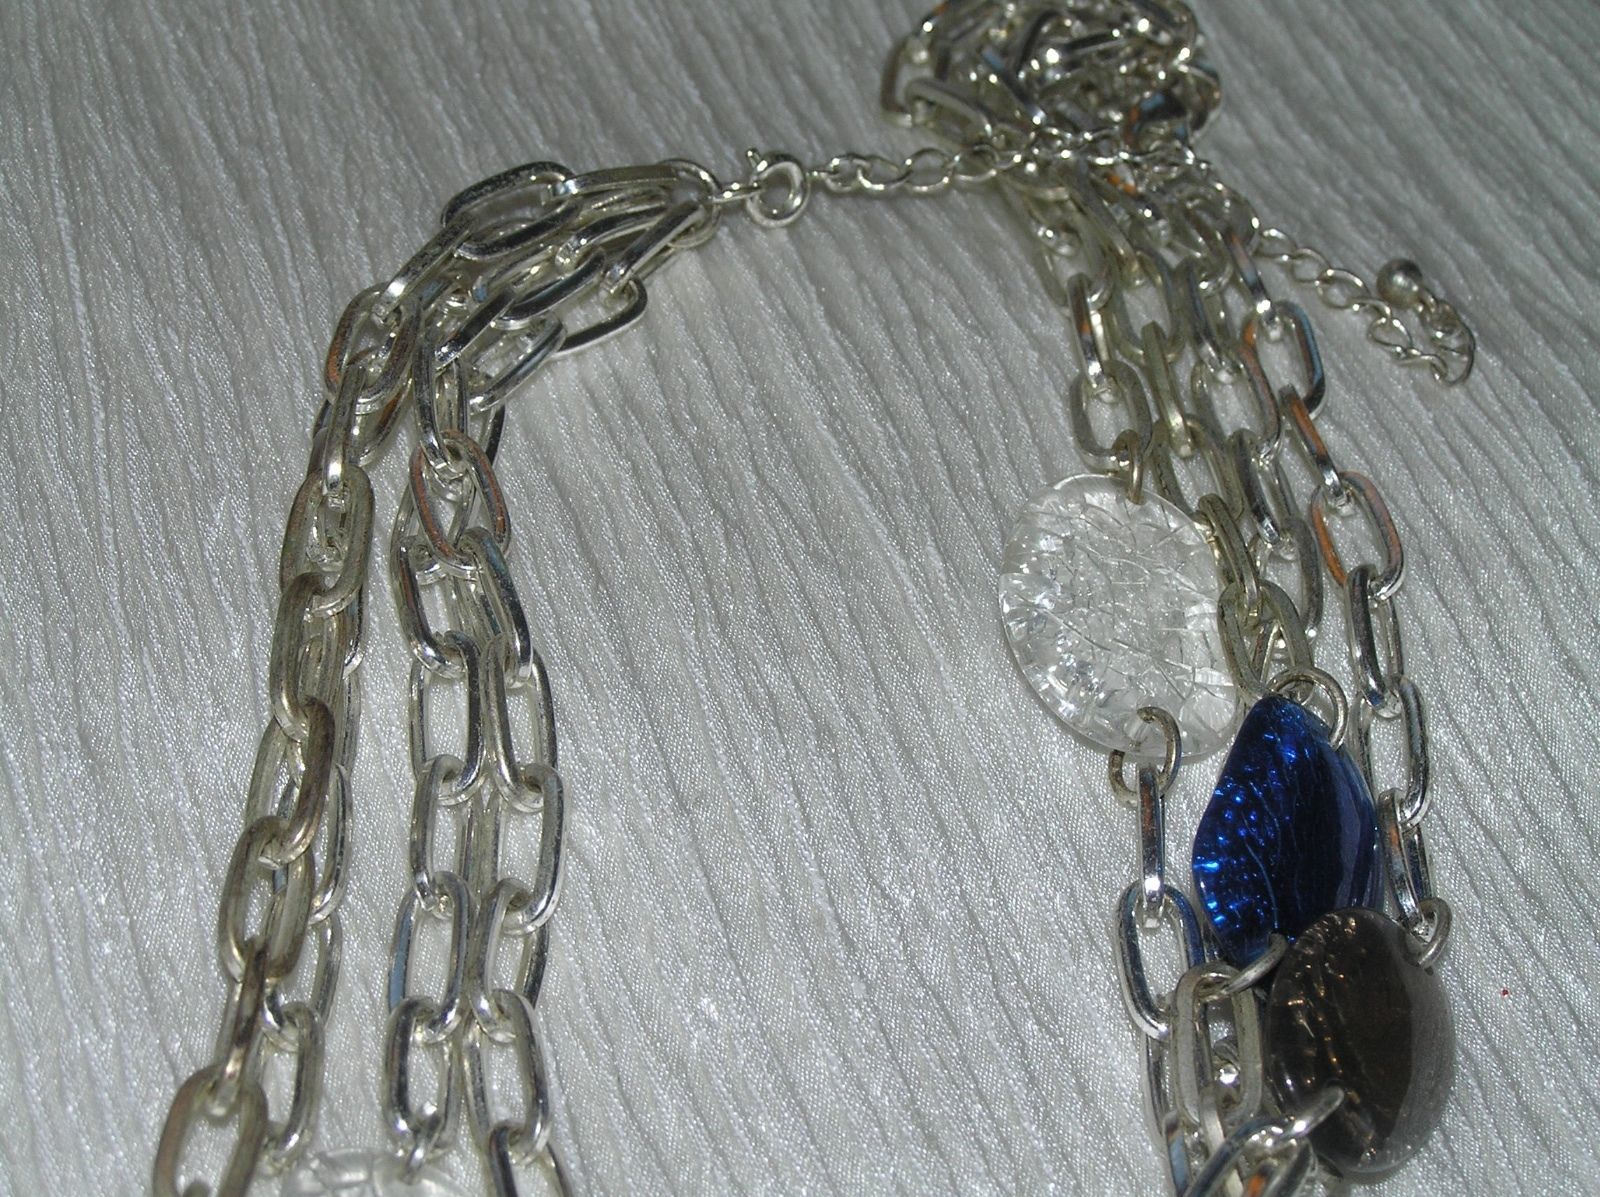 Estate Avon Multistrand Open Silvertone Chain with Crackled Blue Clear Plastic